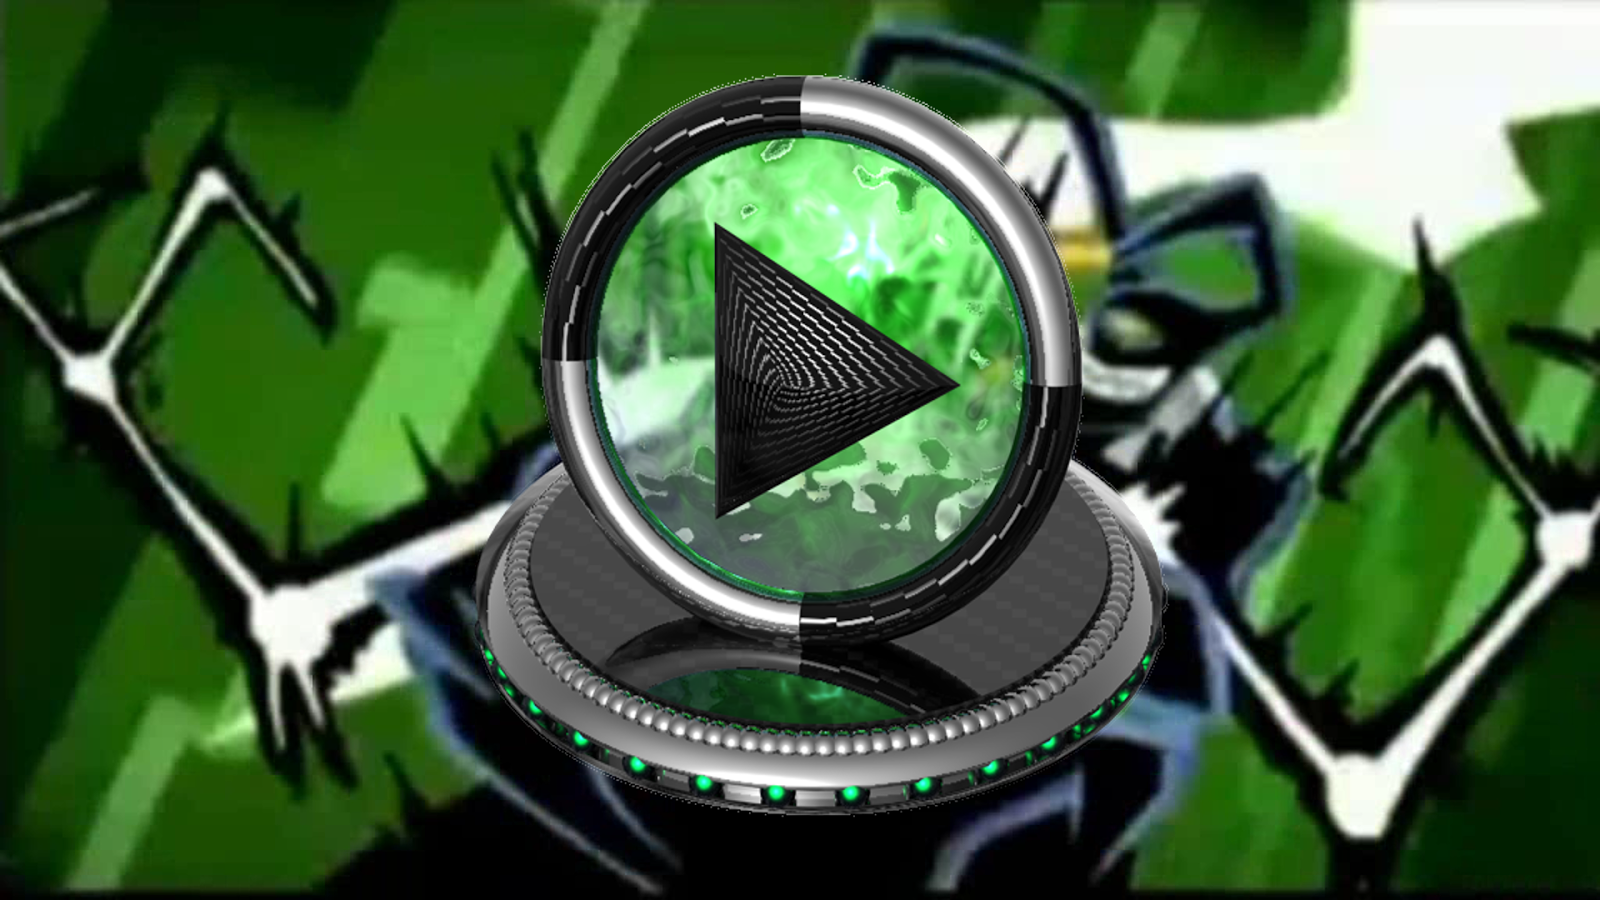 http://theultimatevideos.blogspot.com/2013/10/hora-ben-10-feedback.html